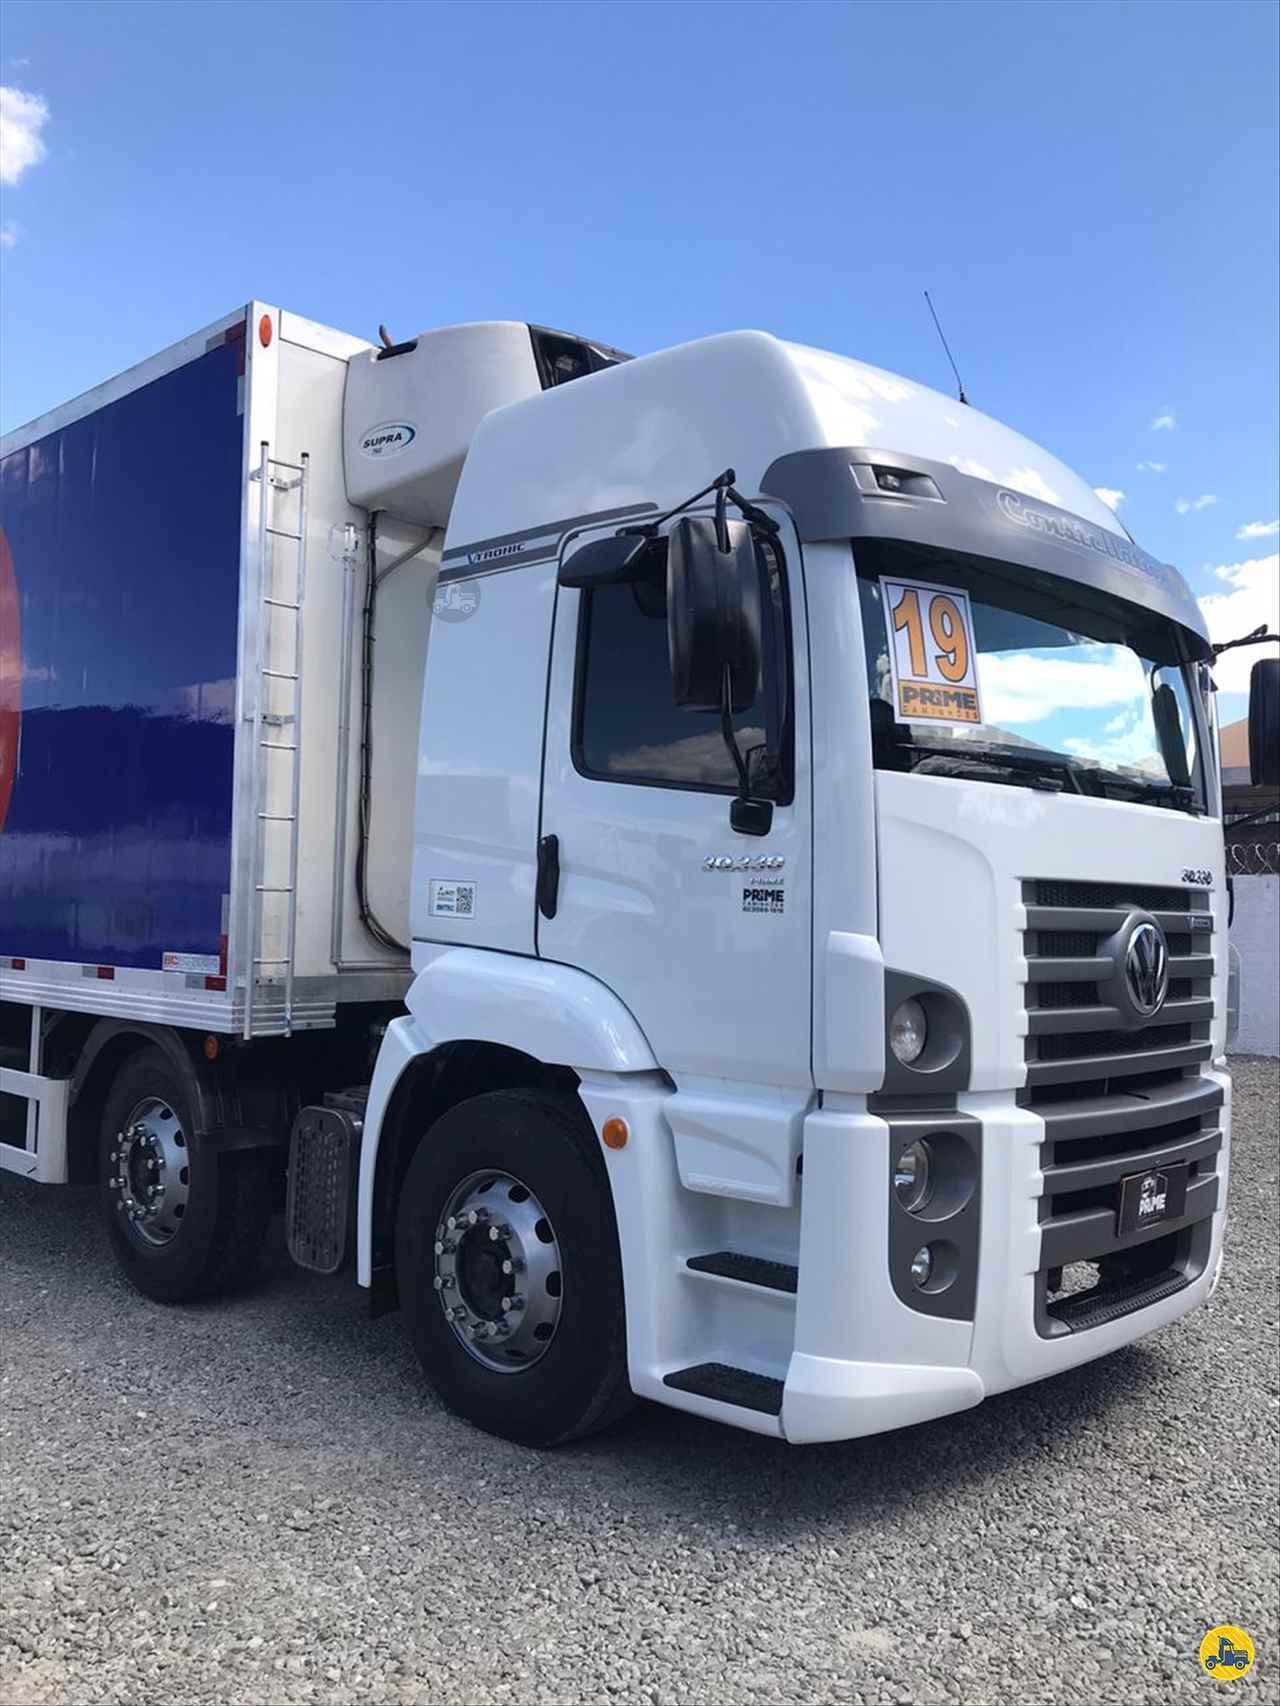 VOLKSWAGEN VW 30330 226km 2018/2019 Prime Caminhões